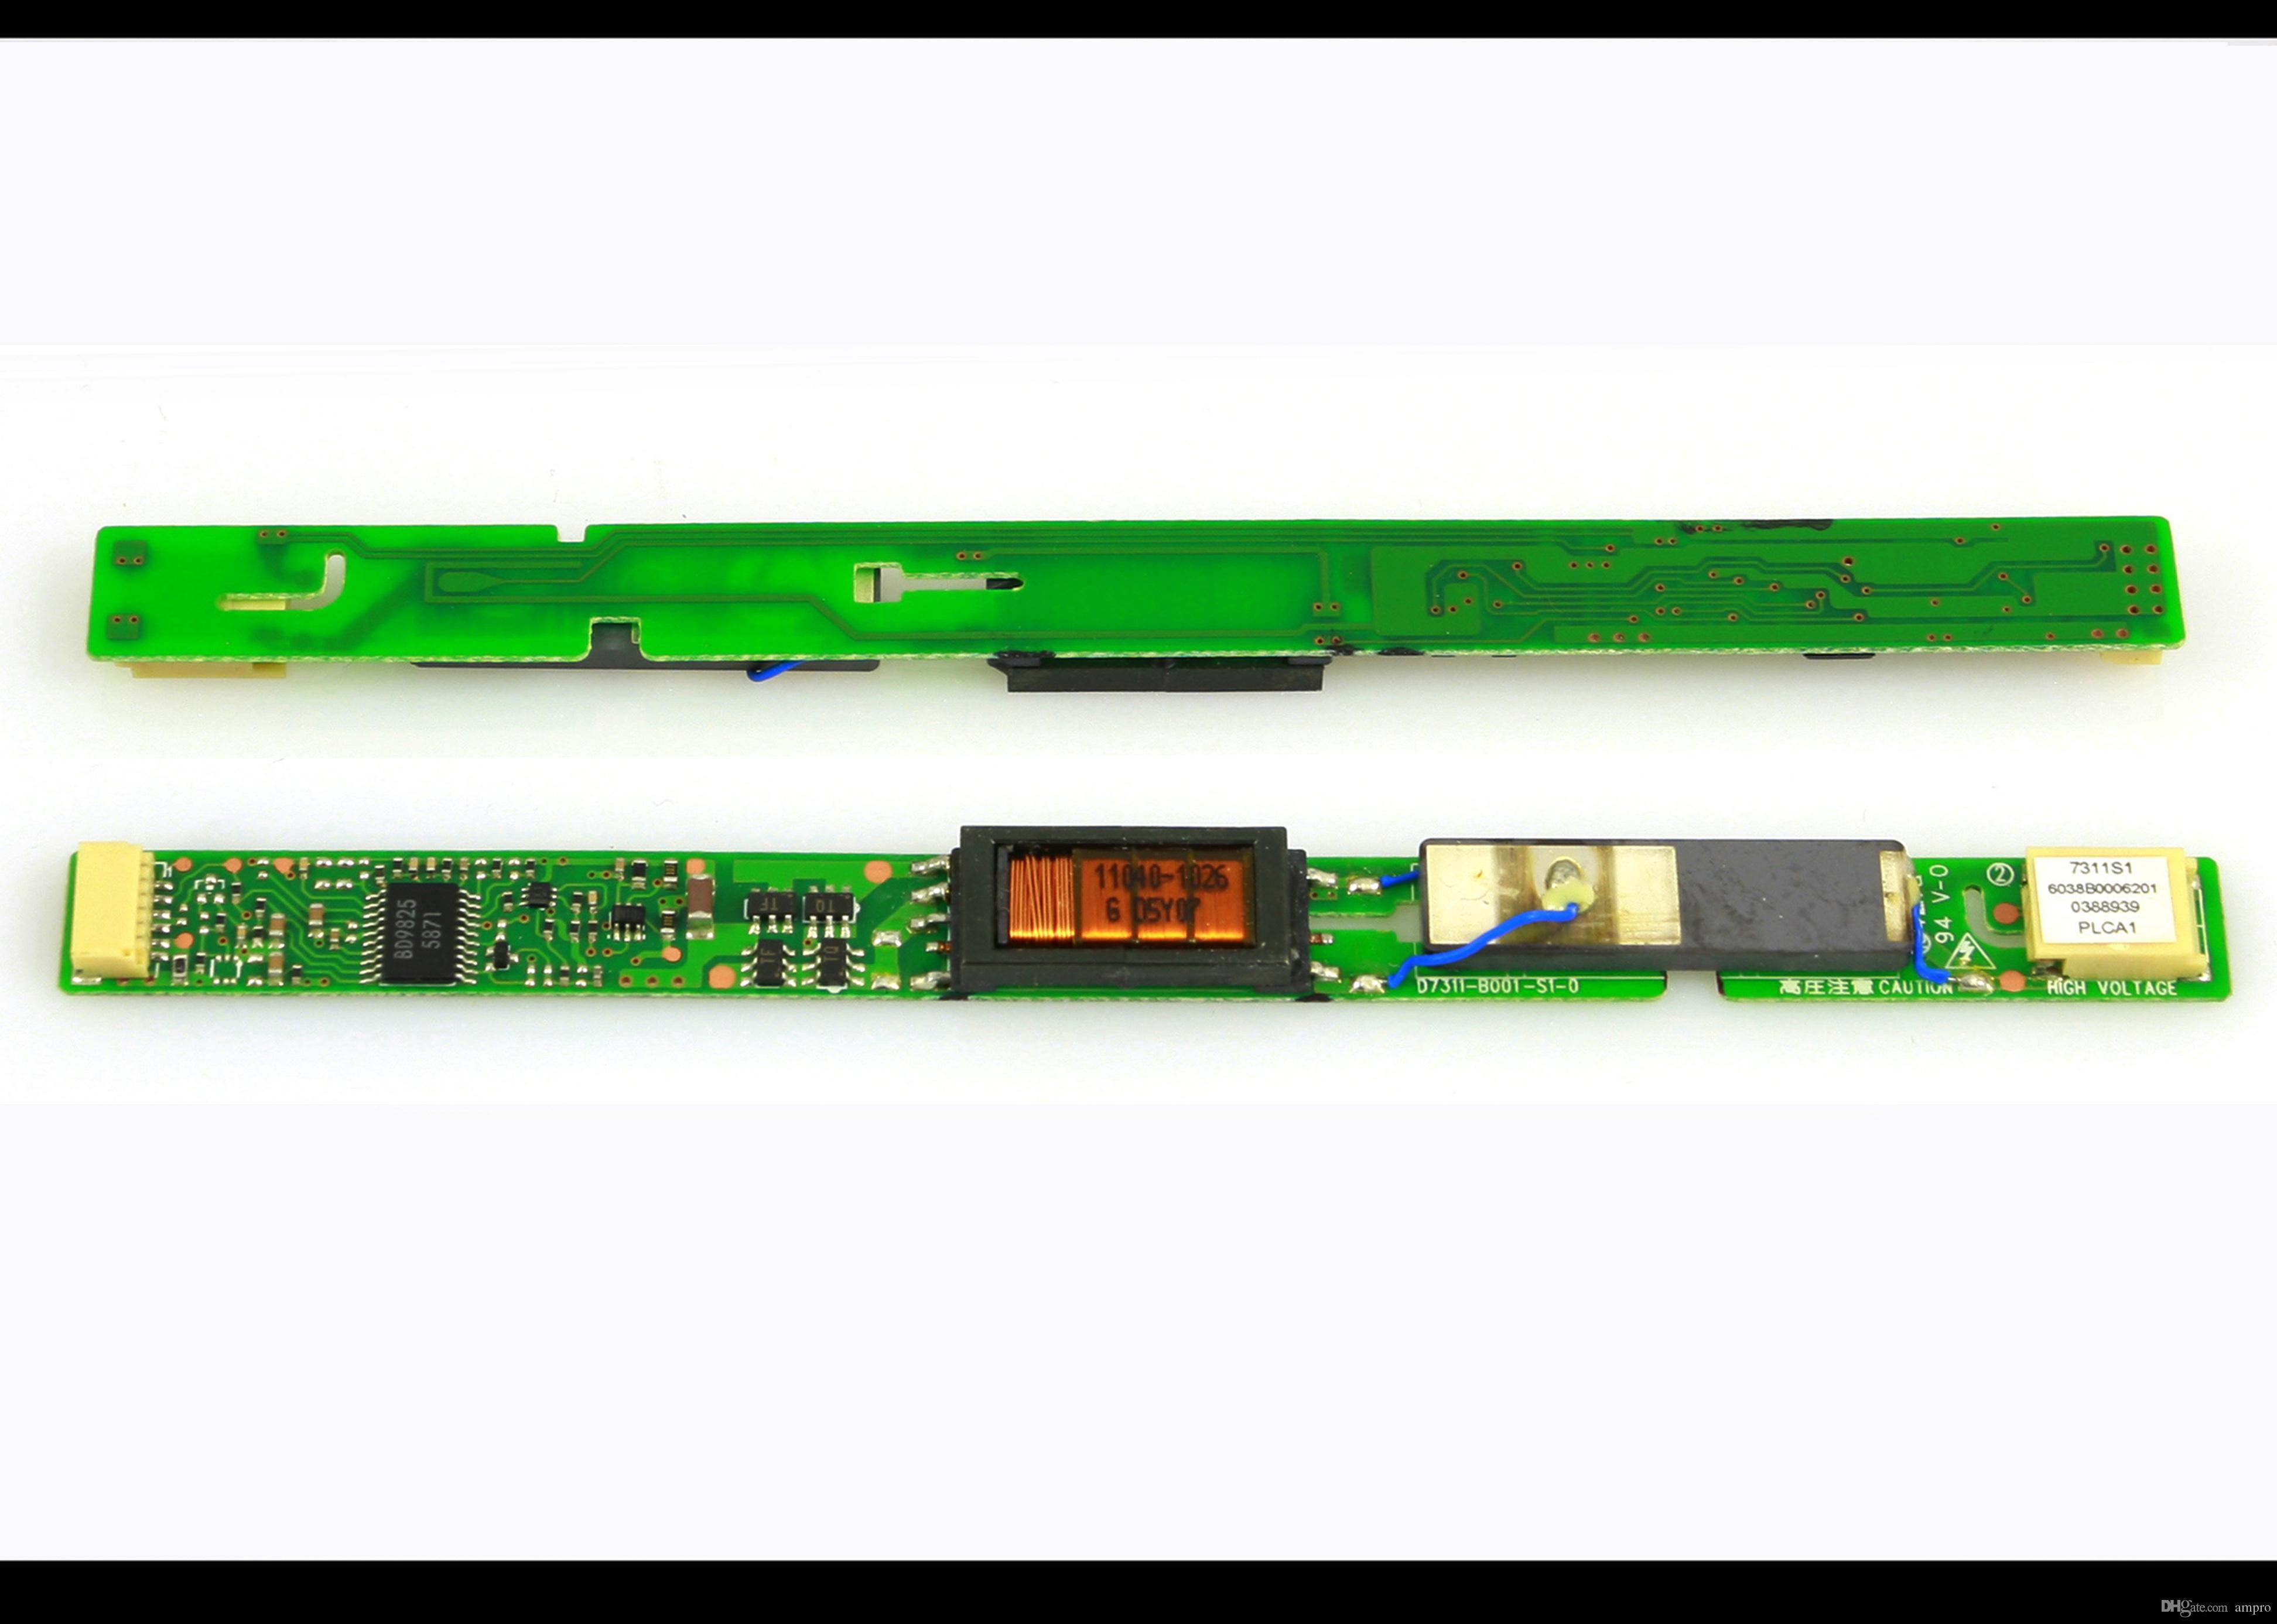 2 x HP Compaq NC6000 NC6120 NC8000 NX5000 NX6110 NX6120 EVO N610V  -  D7311-B001-S1-0